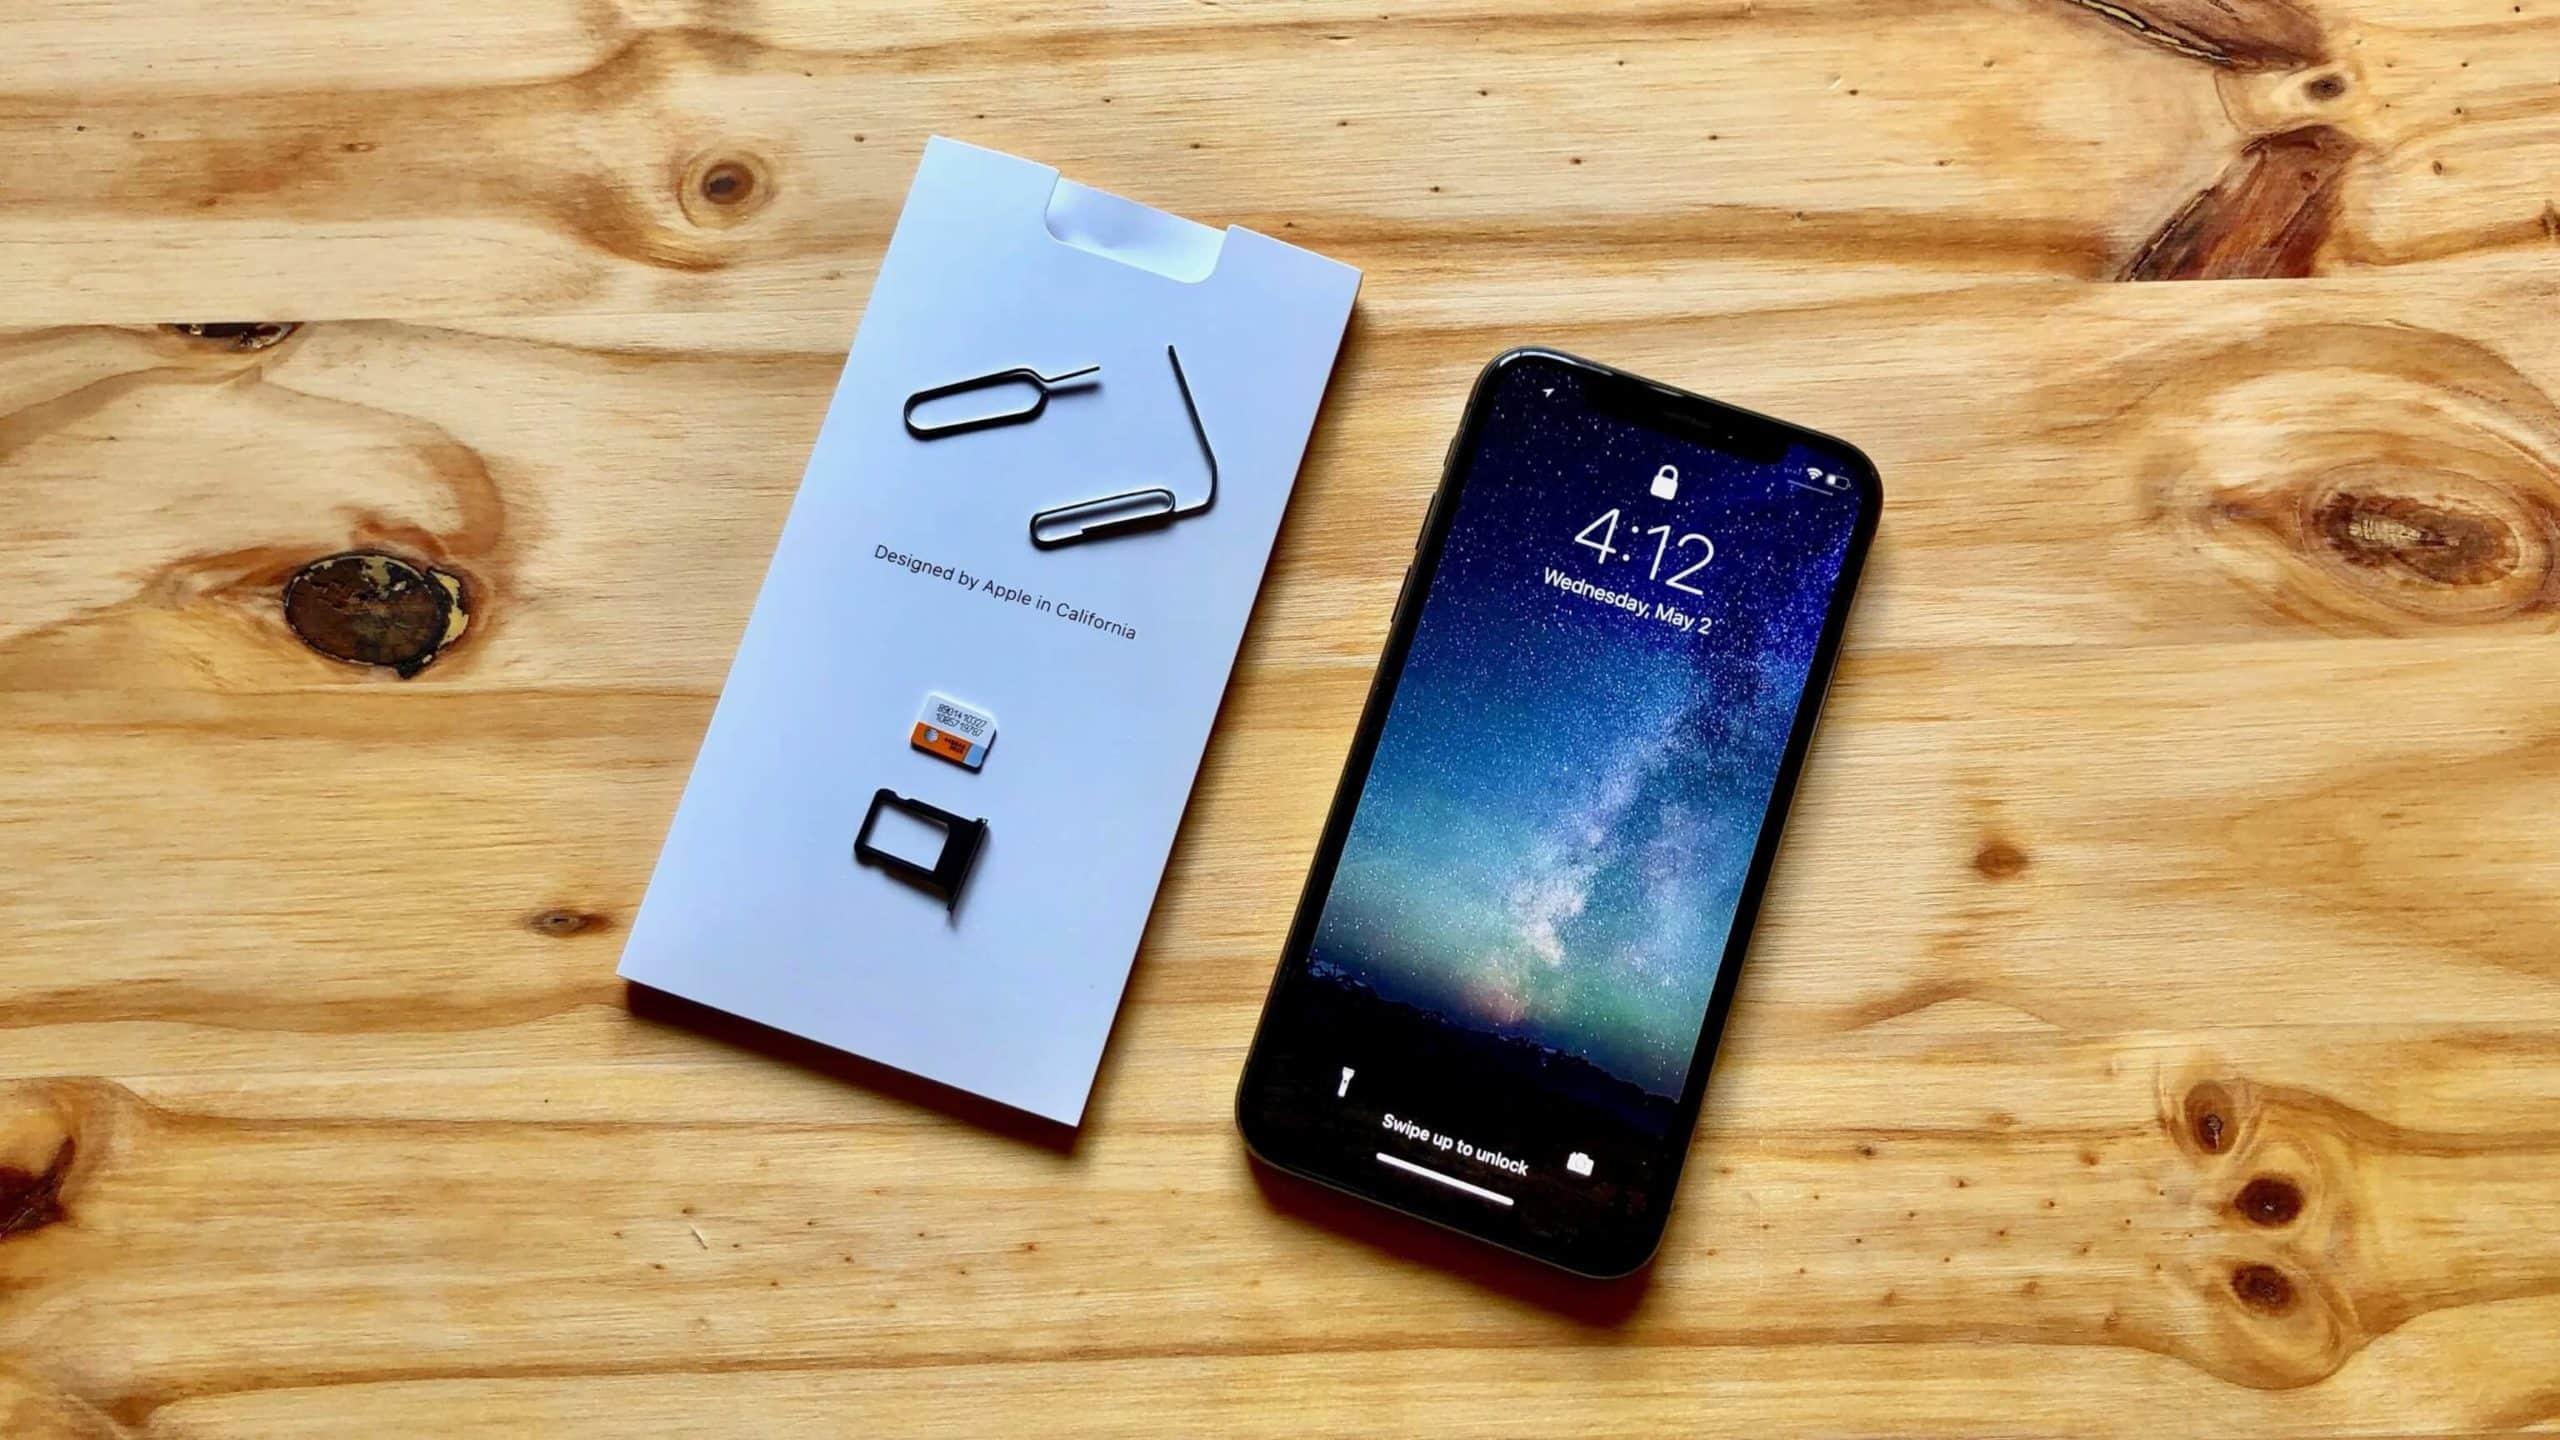 Dual-SIM-iPhone unter iOS 12 Beta 5 - 9to5Mac